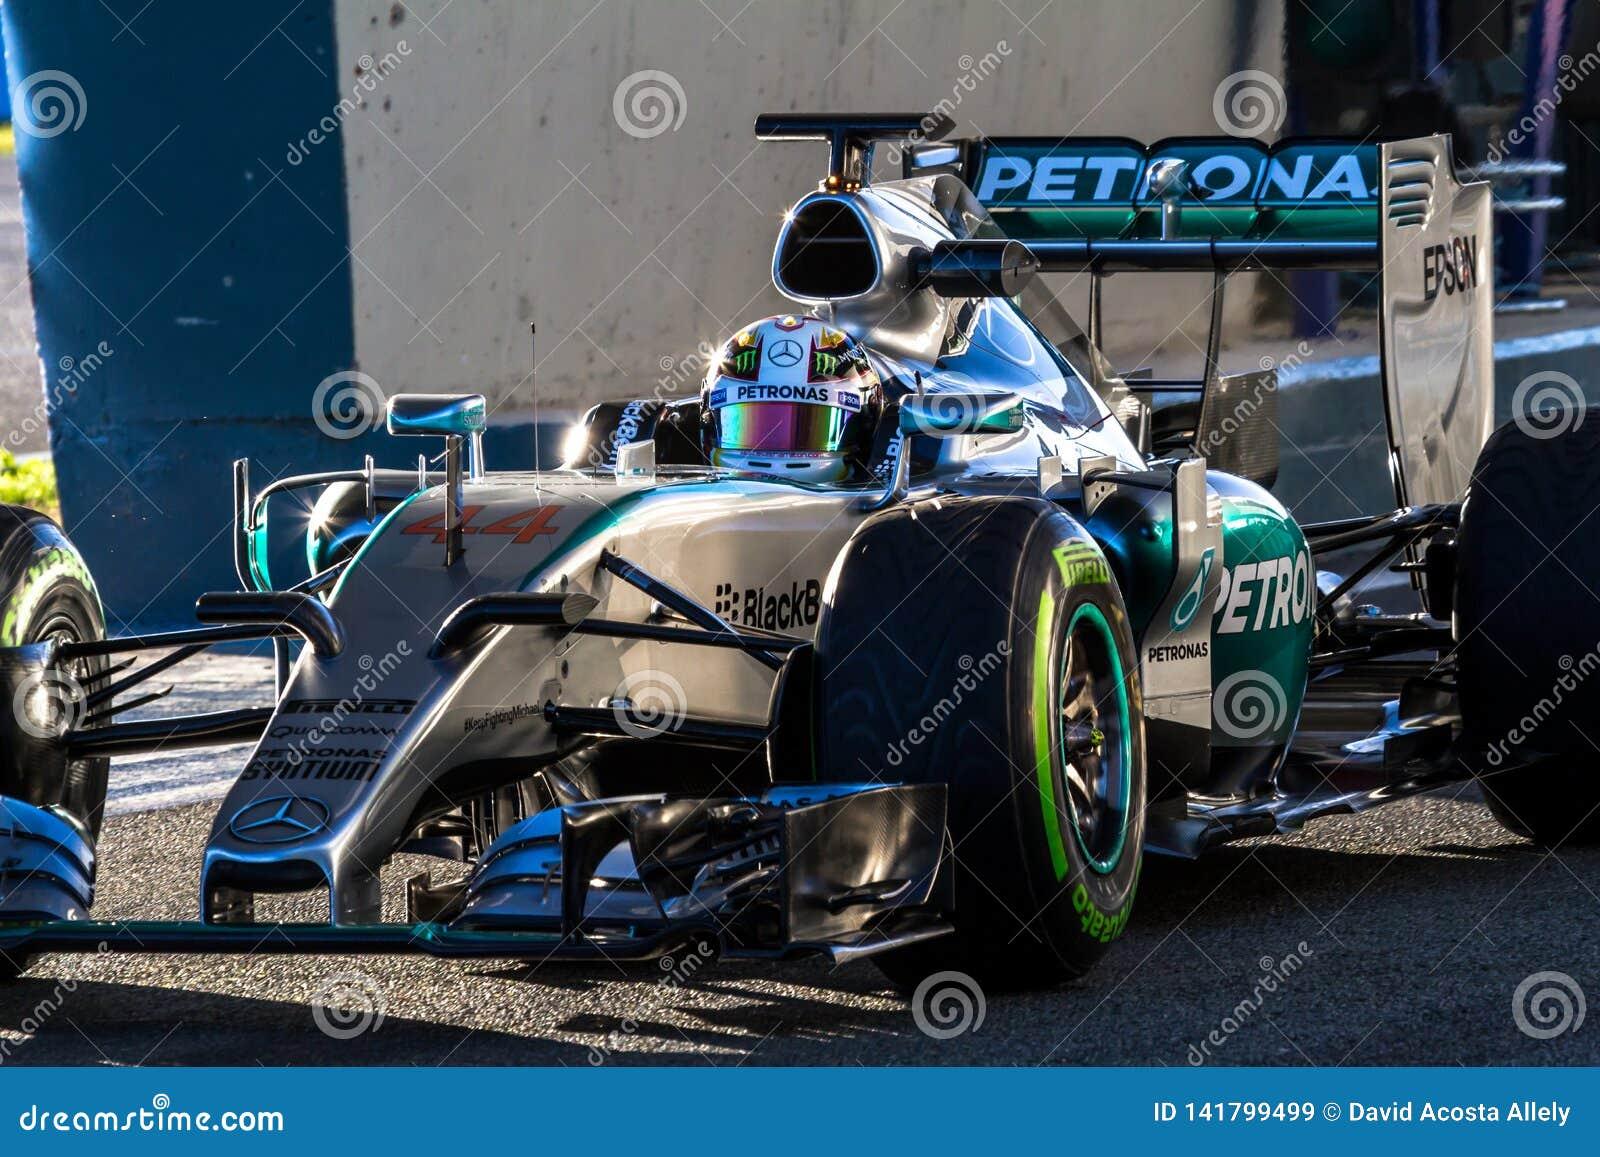 Mercedes AMG Petronas F1, Lewis Hamilton, 2015